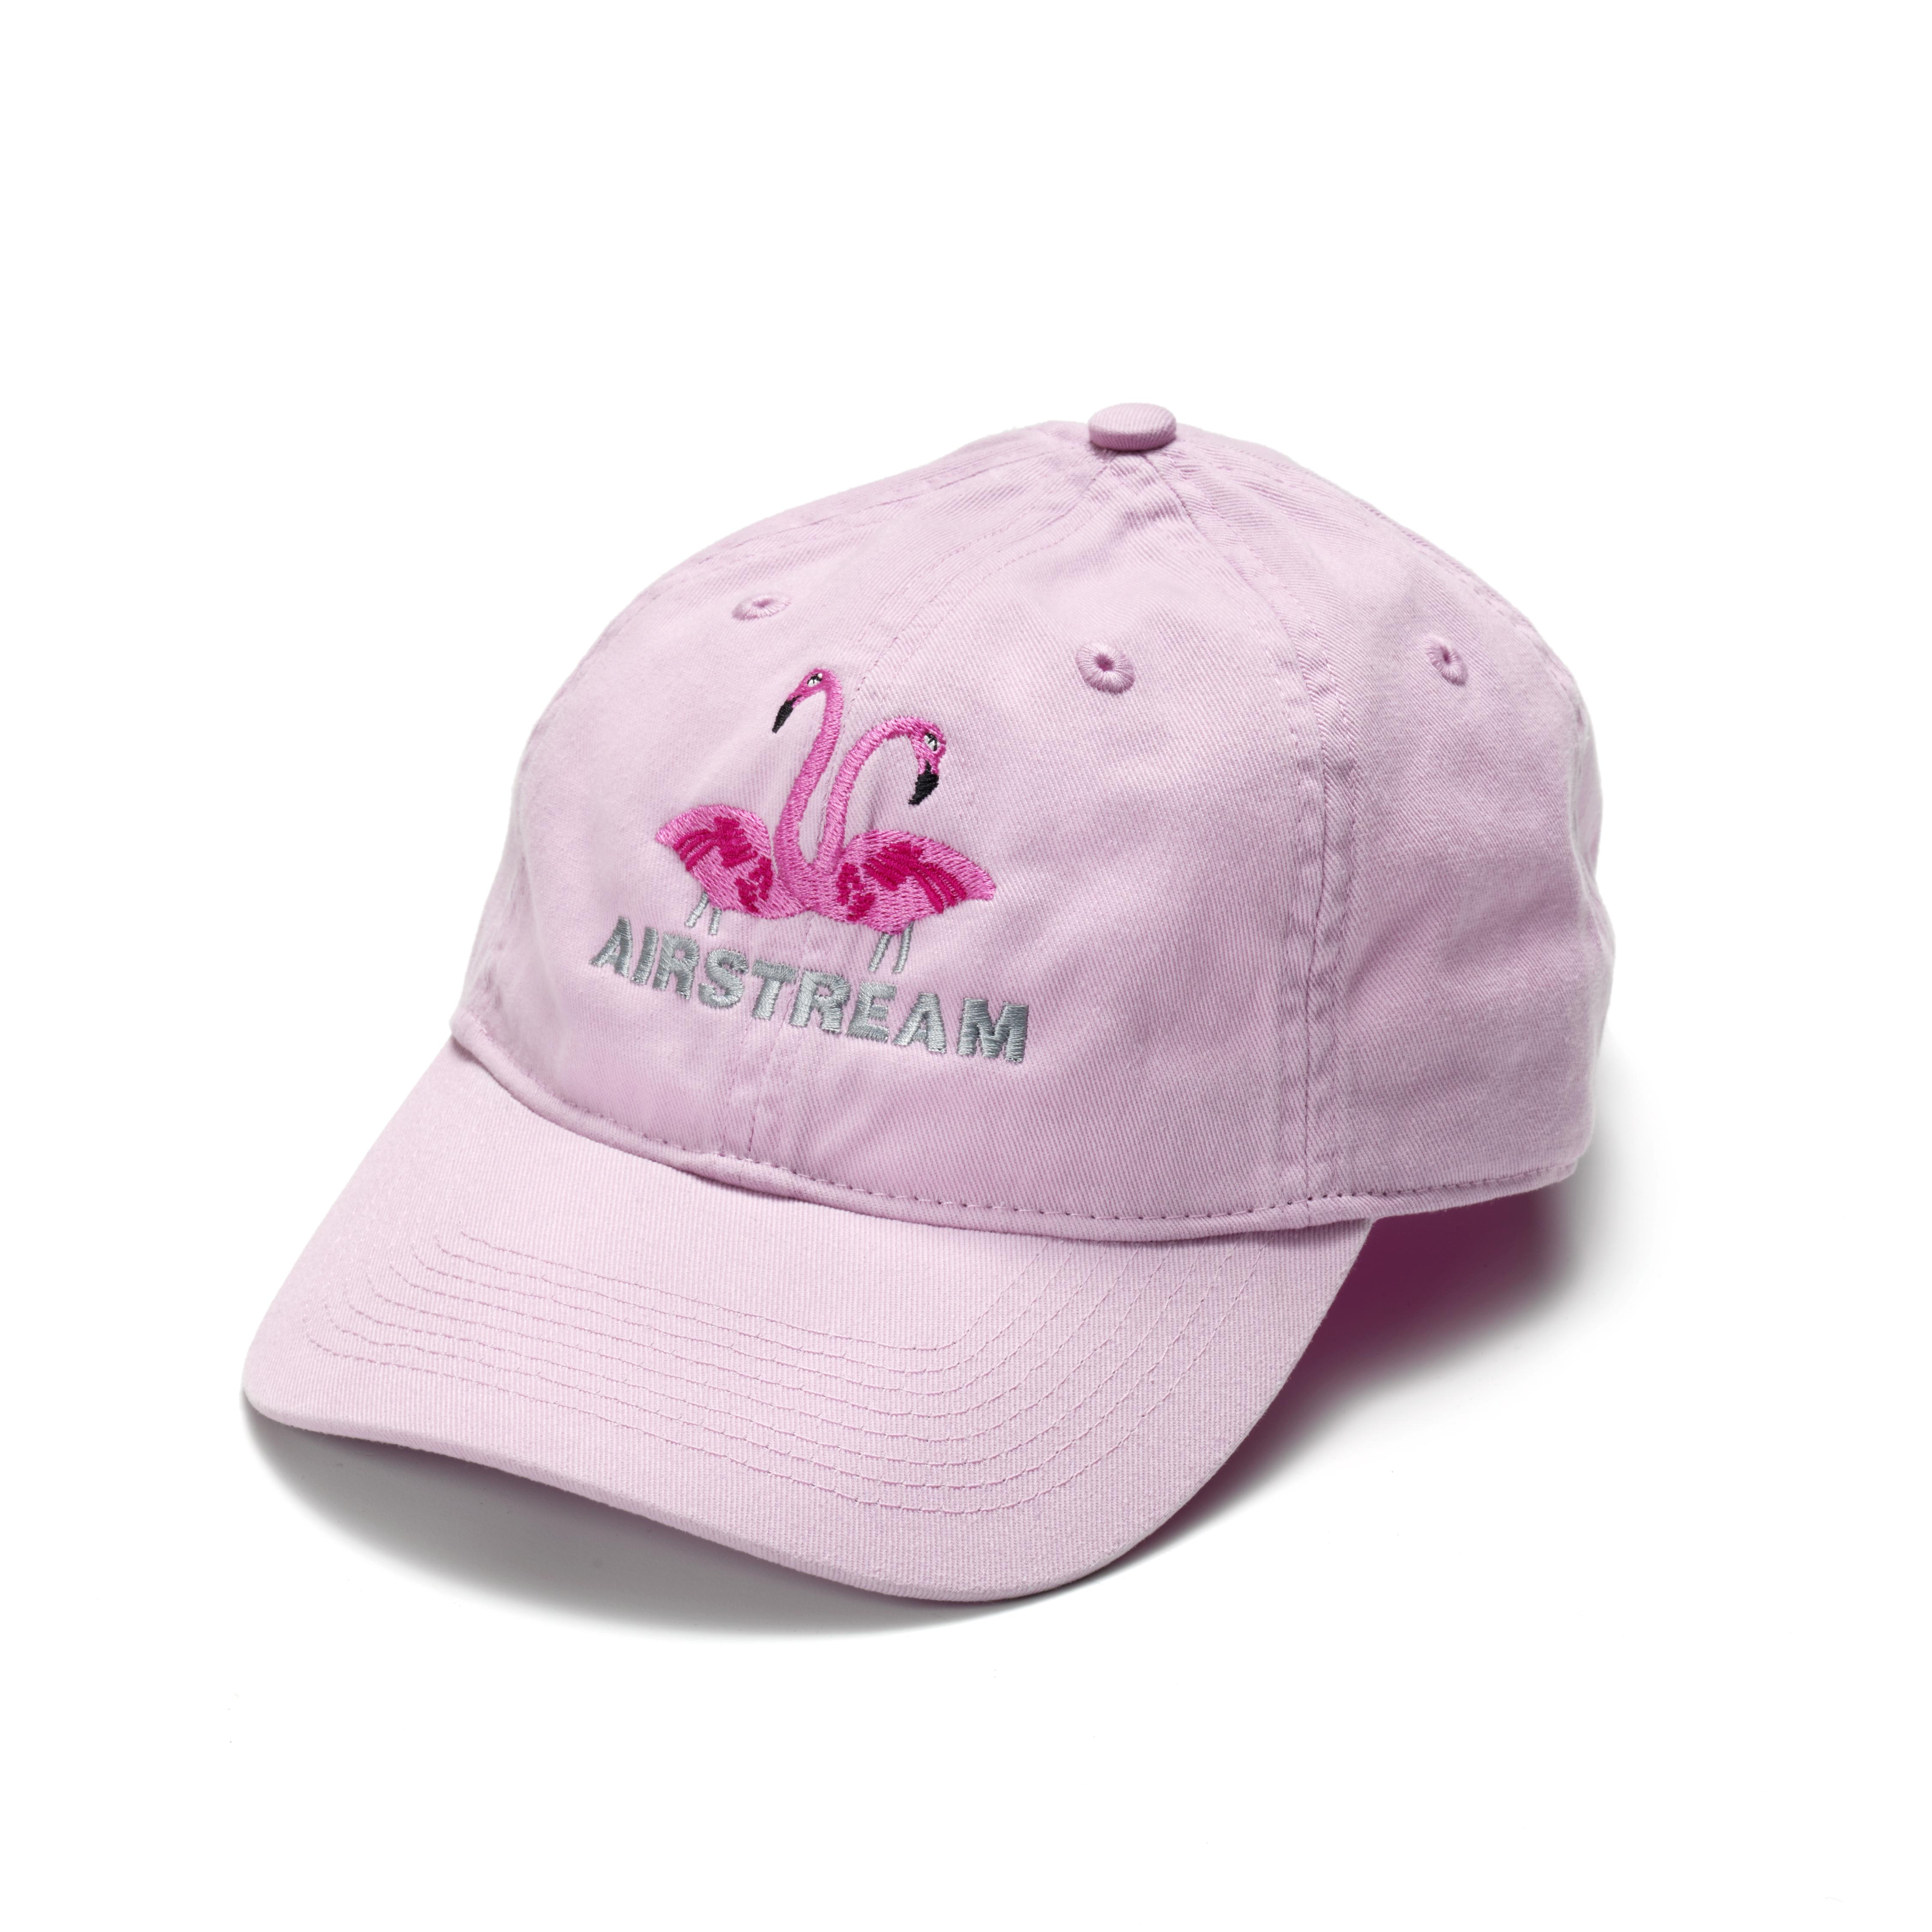 AIRMKT eCom PN 56211W-69 Flamingo Ladies Hat - Pink_44452 WEB